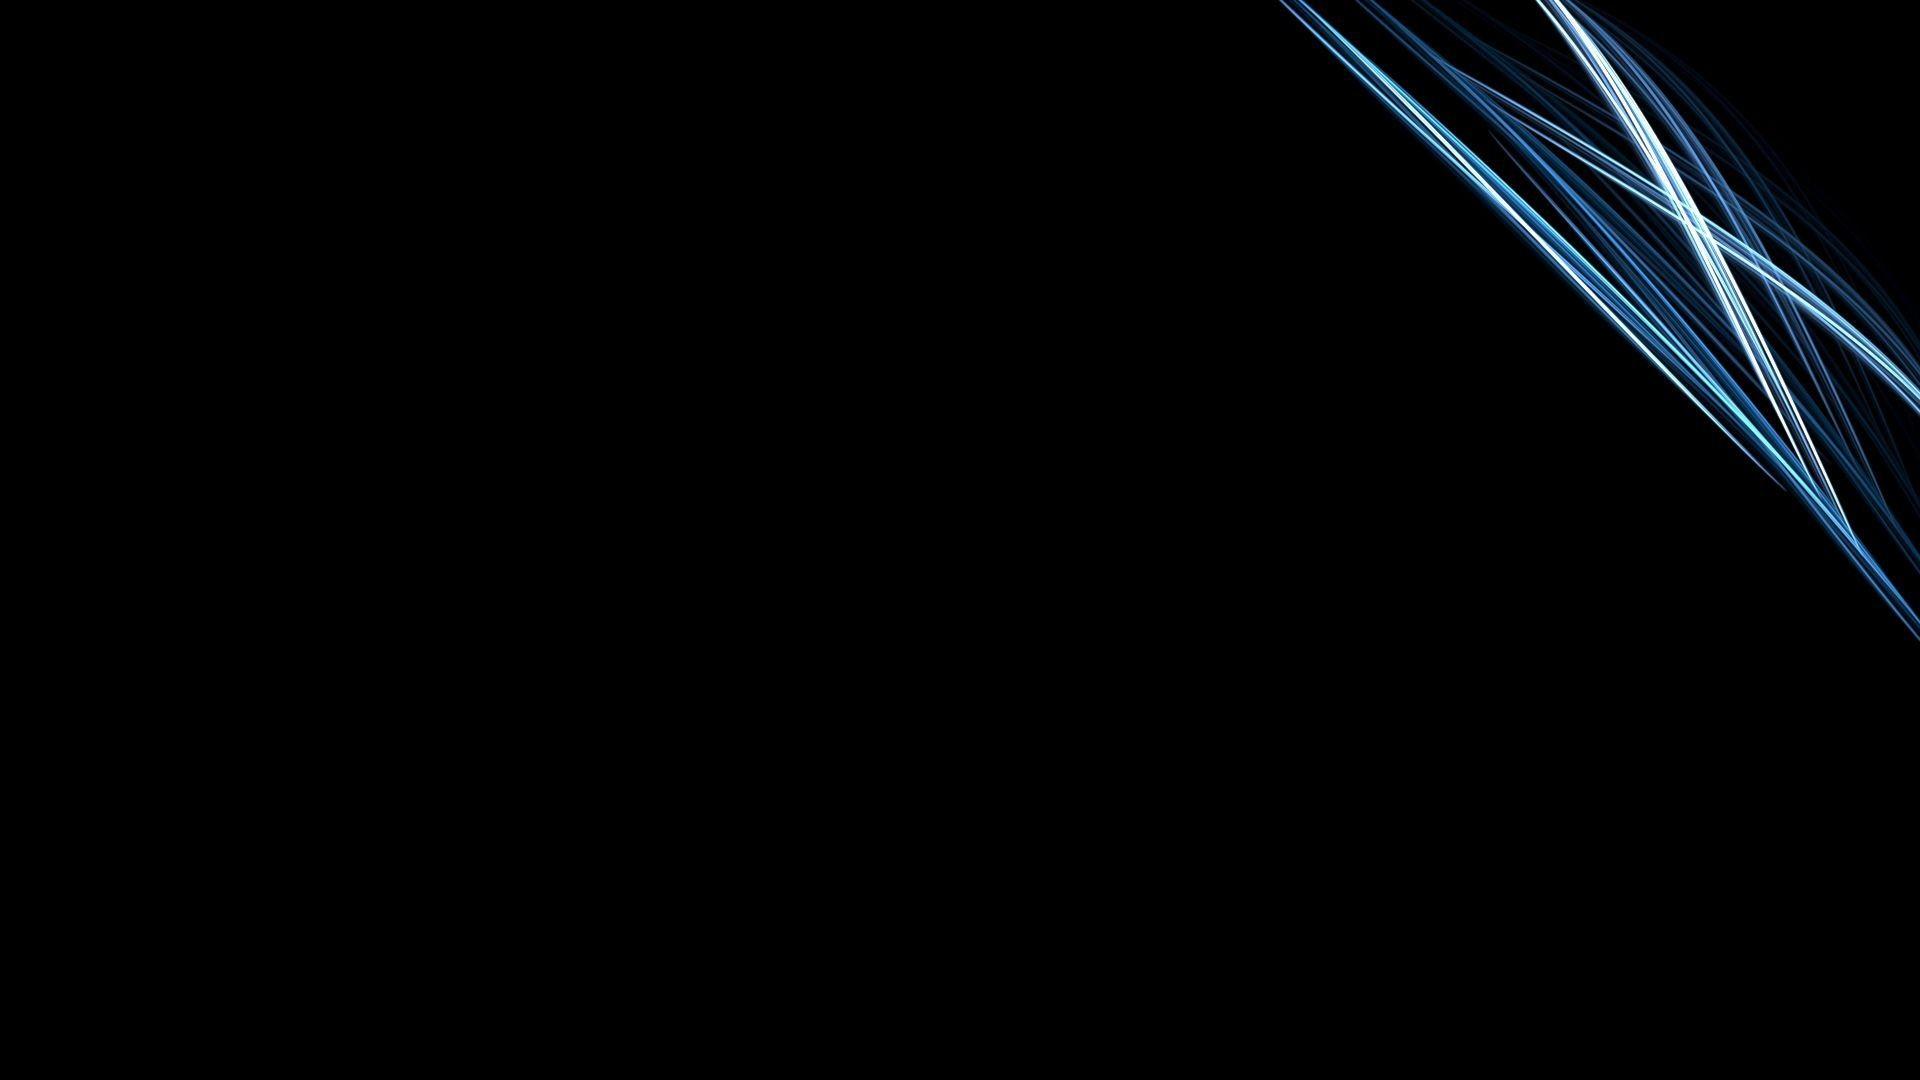 Black blue abstract waves 1680×1050 35 desktop hd .